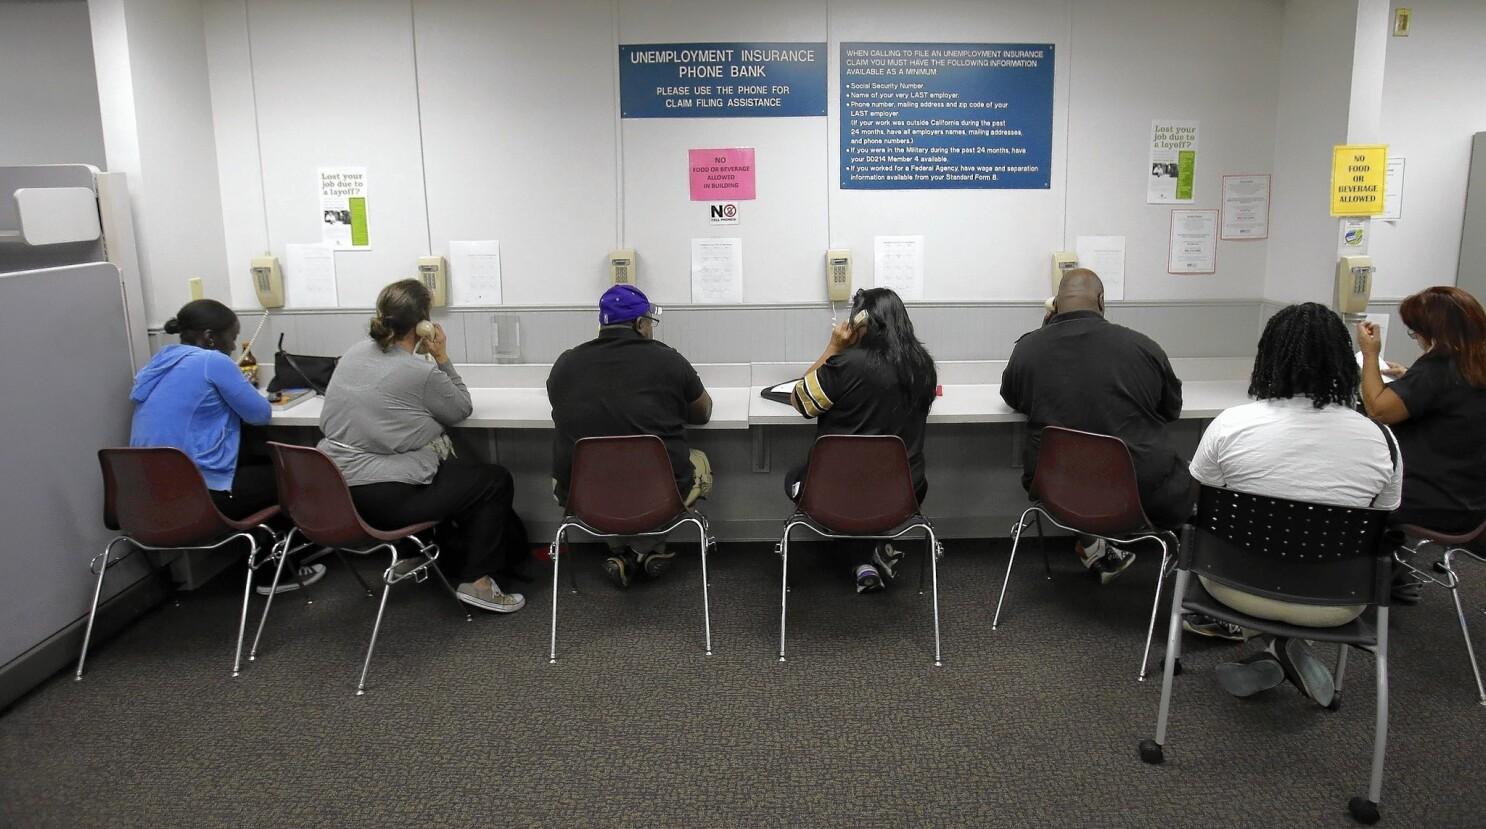 EDD makes big improvements in phone service - Los Angeles Times